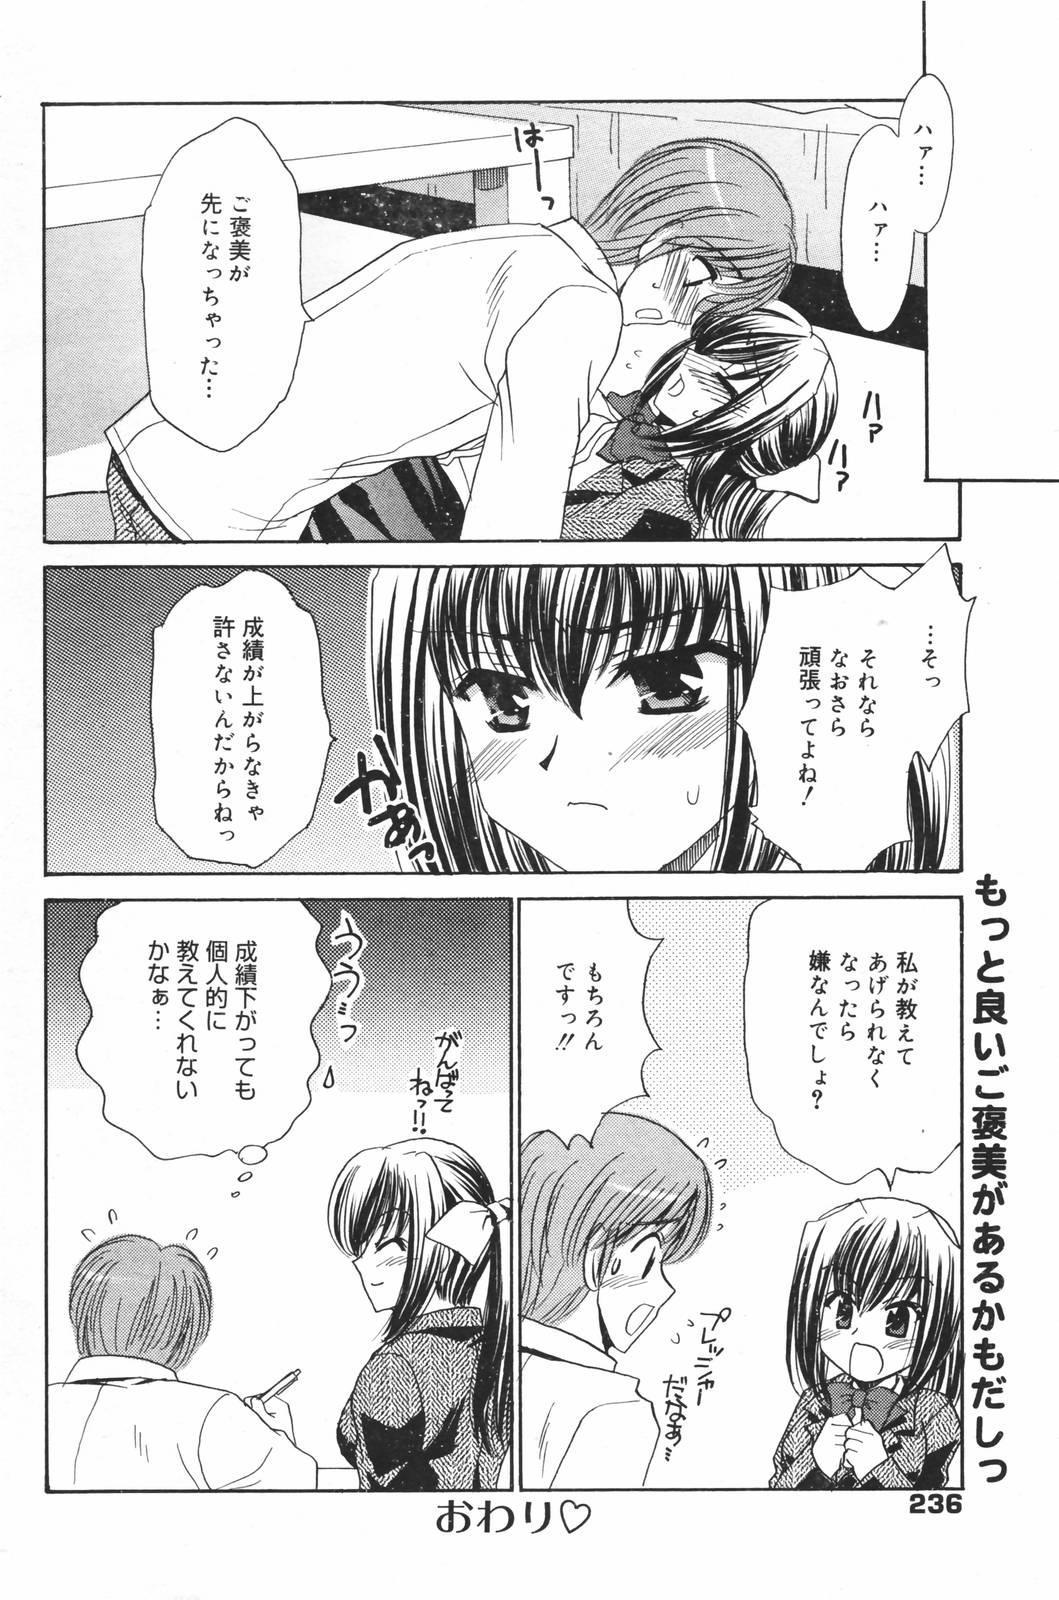 Manga Bangaichi 2007-03 235